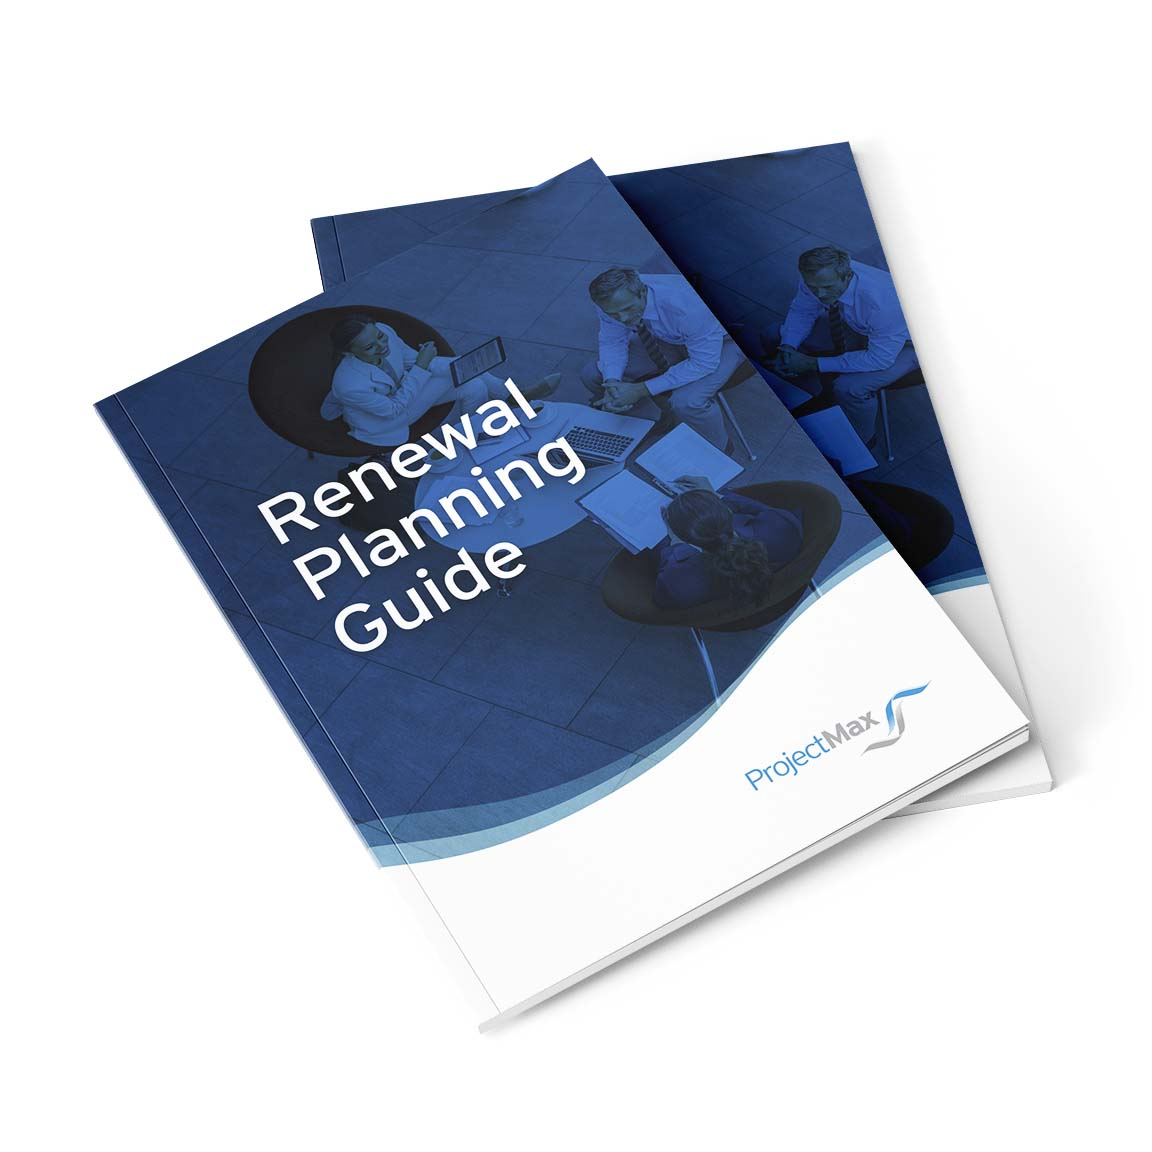 Renewal Planning Guide